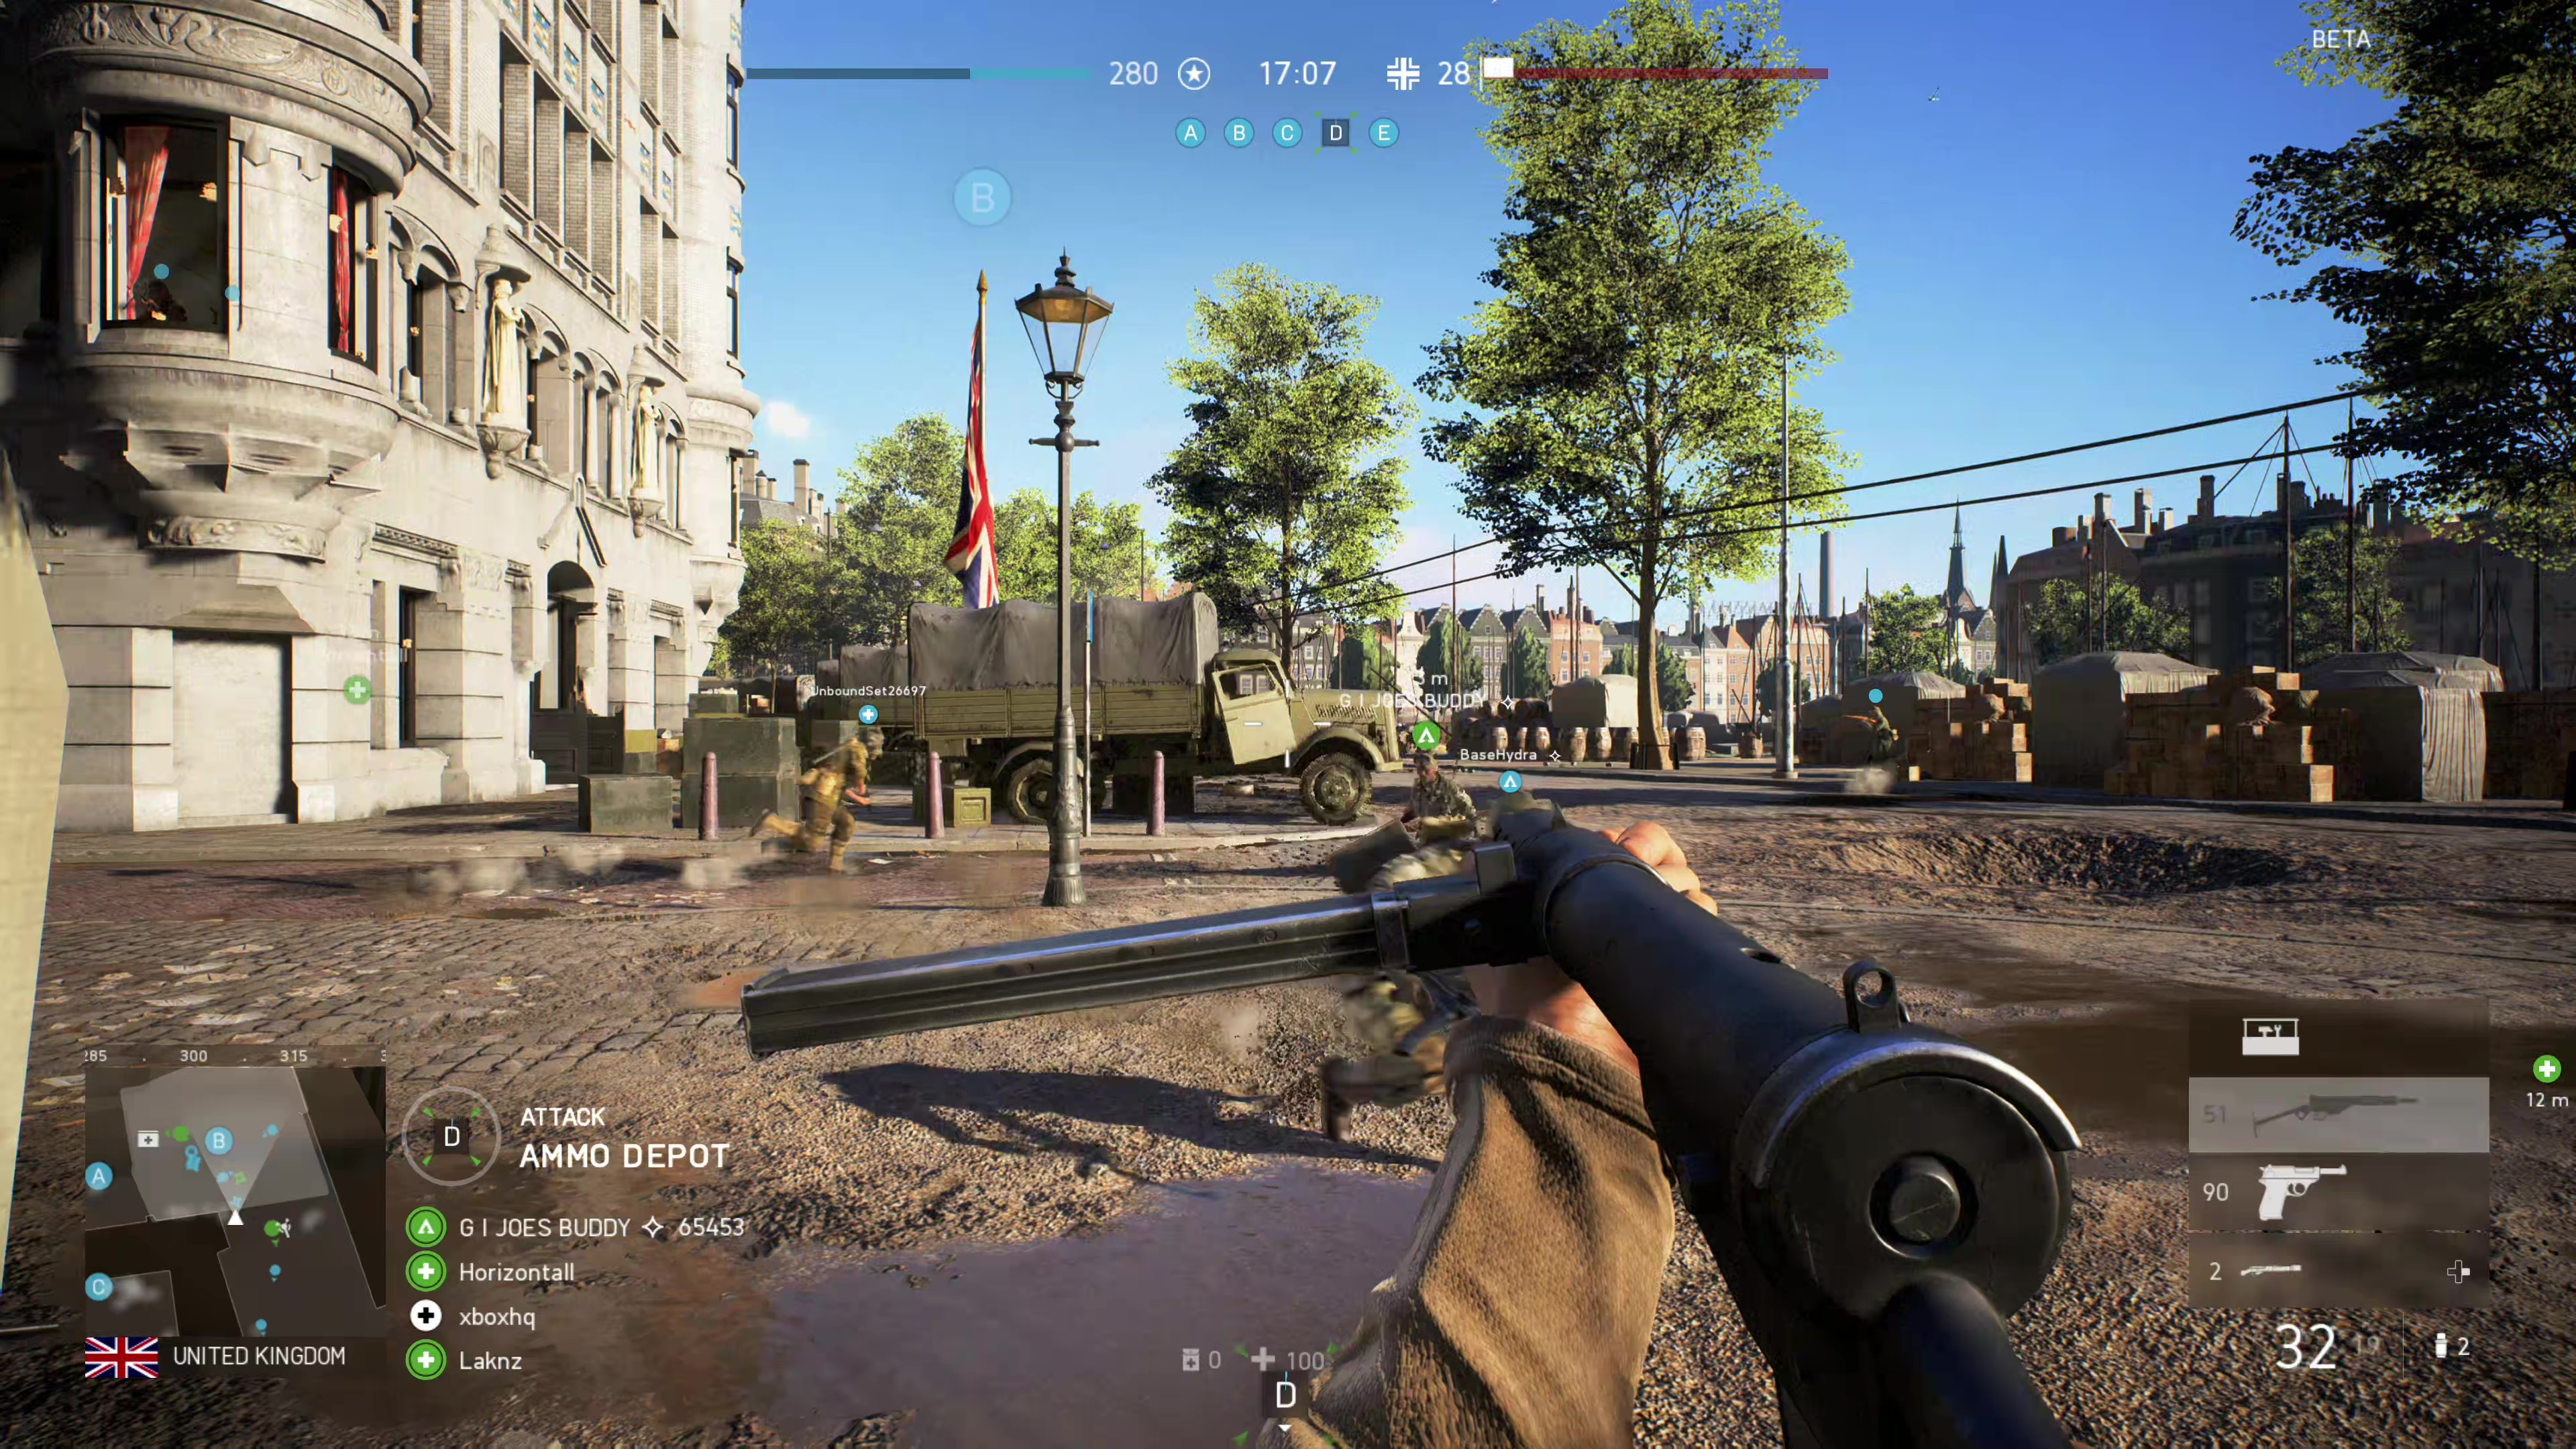 69a3654e029 Battlefield 5 Screenshots Image  16792 - XboxOne-HQ.COM